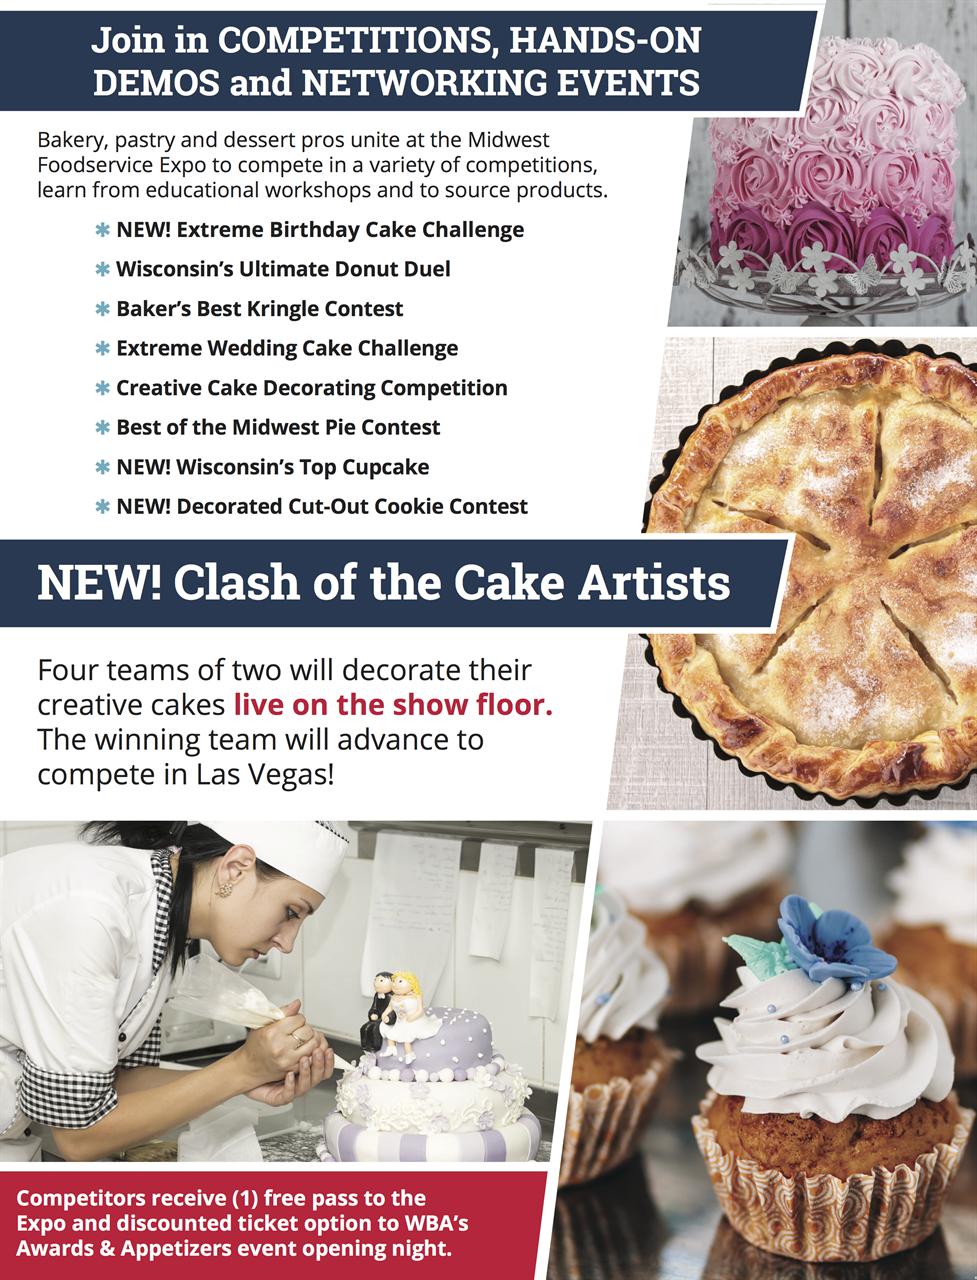 WBA - Wisconsin Bakers Association - 2019 Baking and Cake